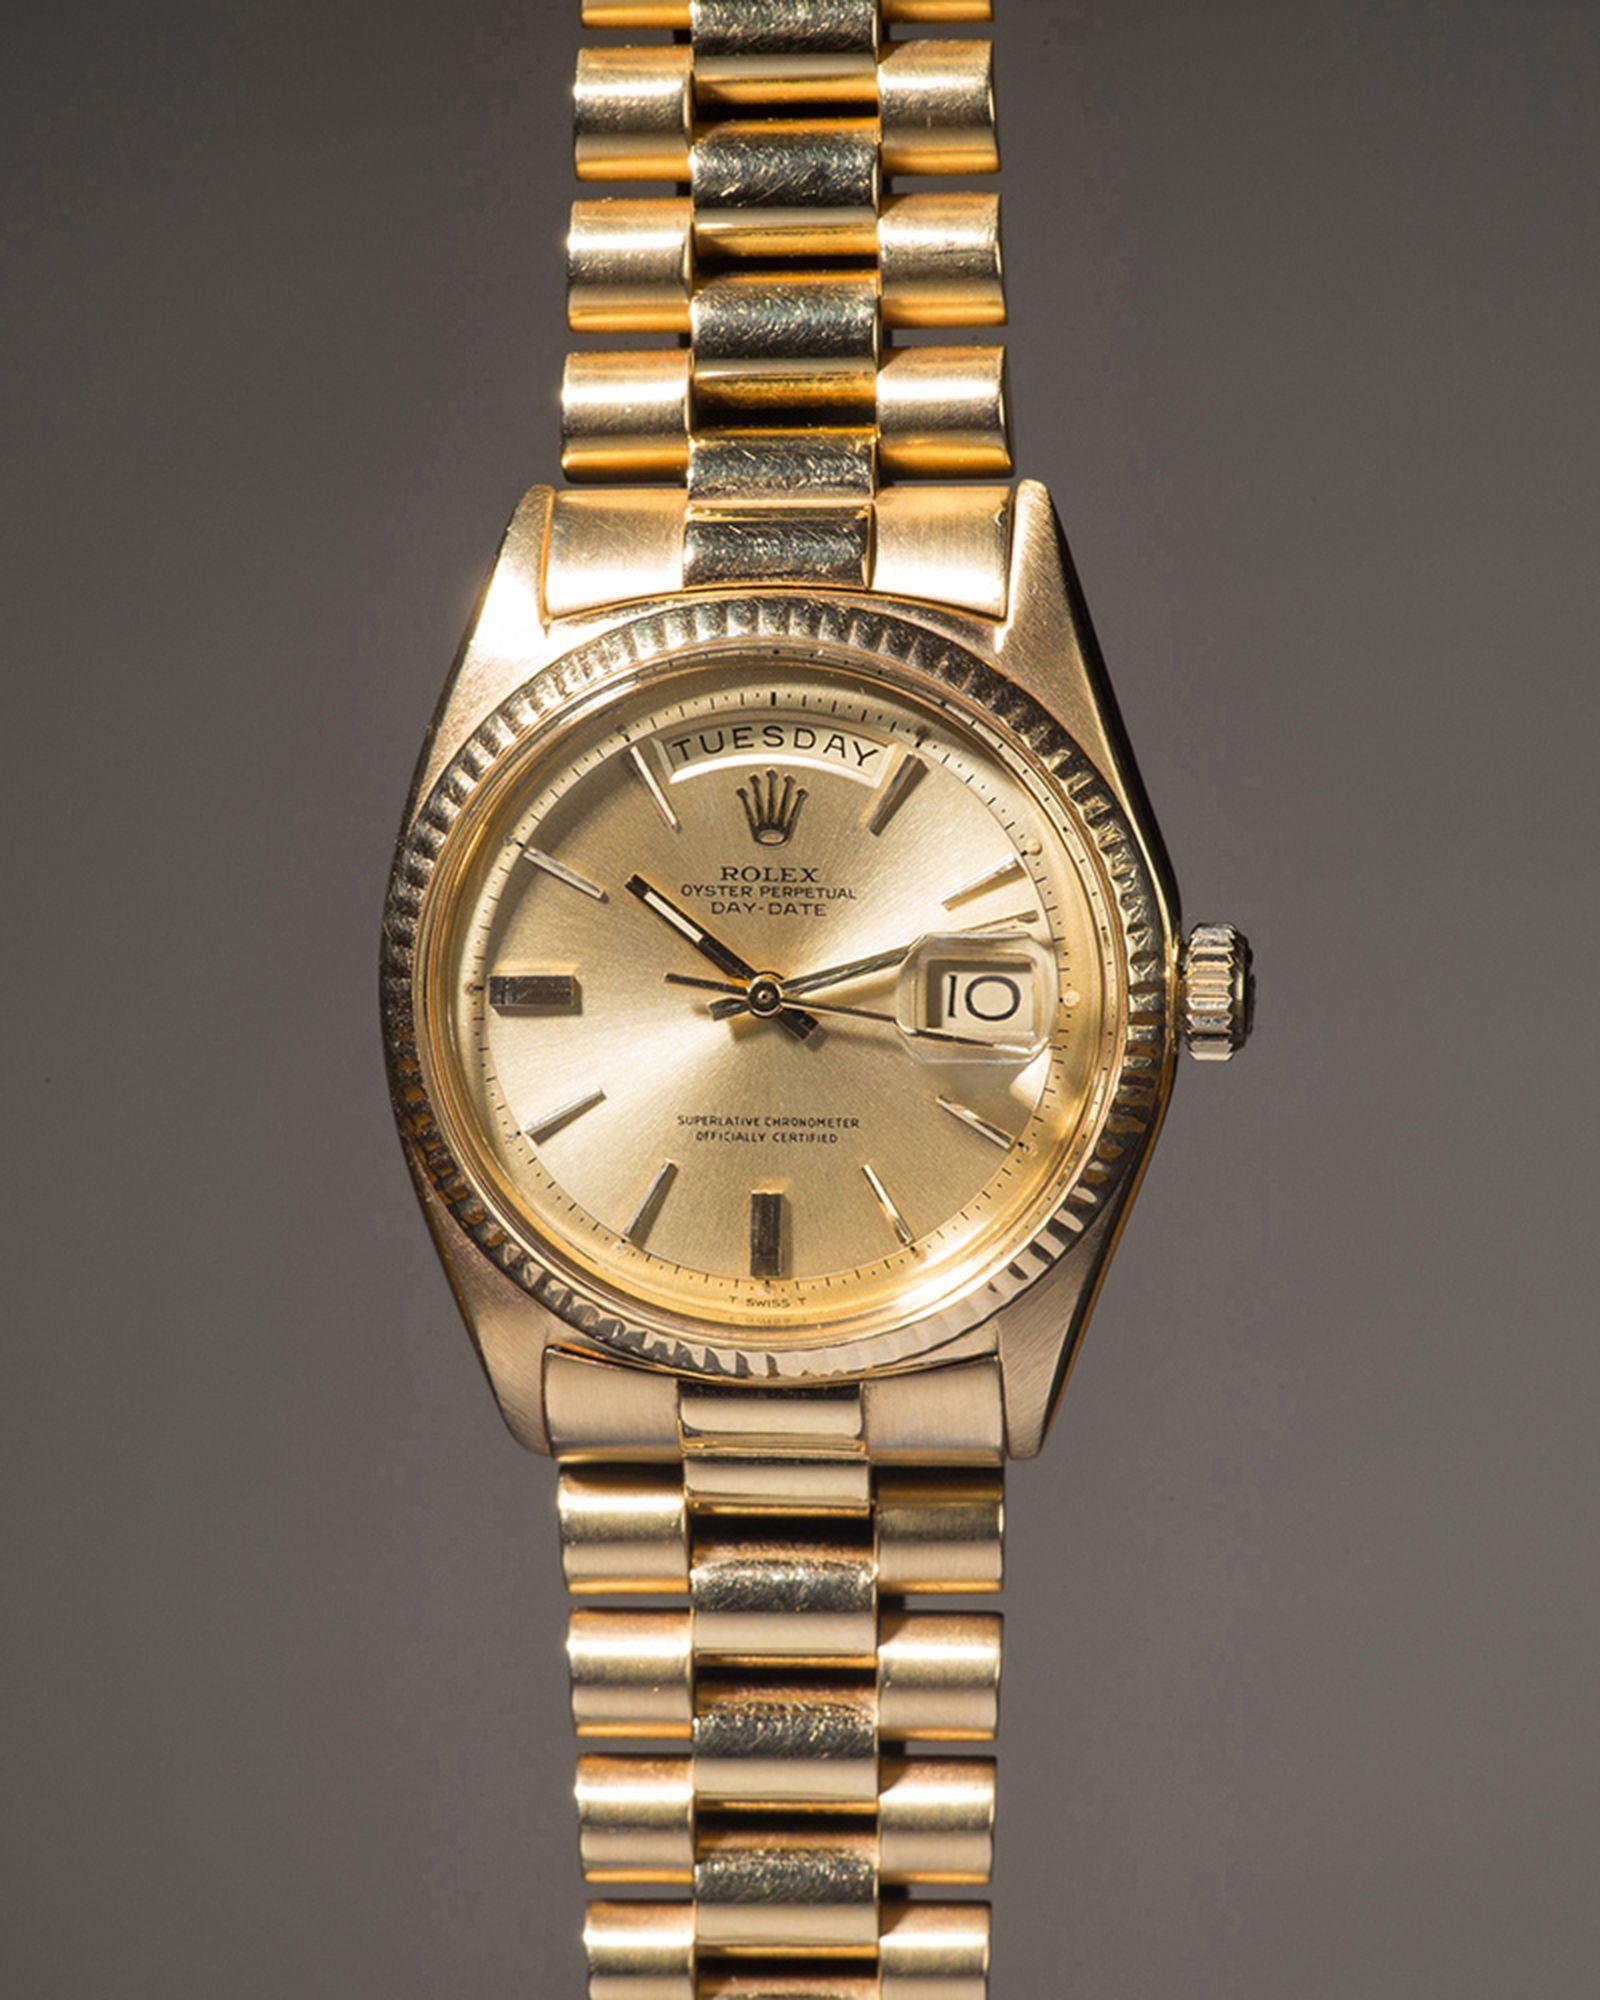 rolex-watches-phillips-auction-01